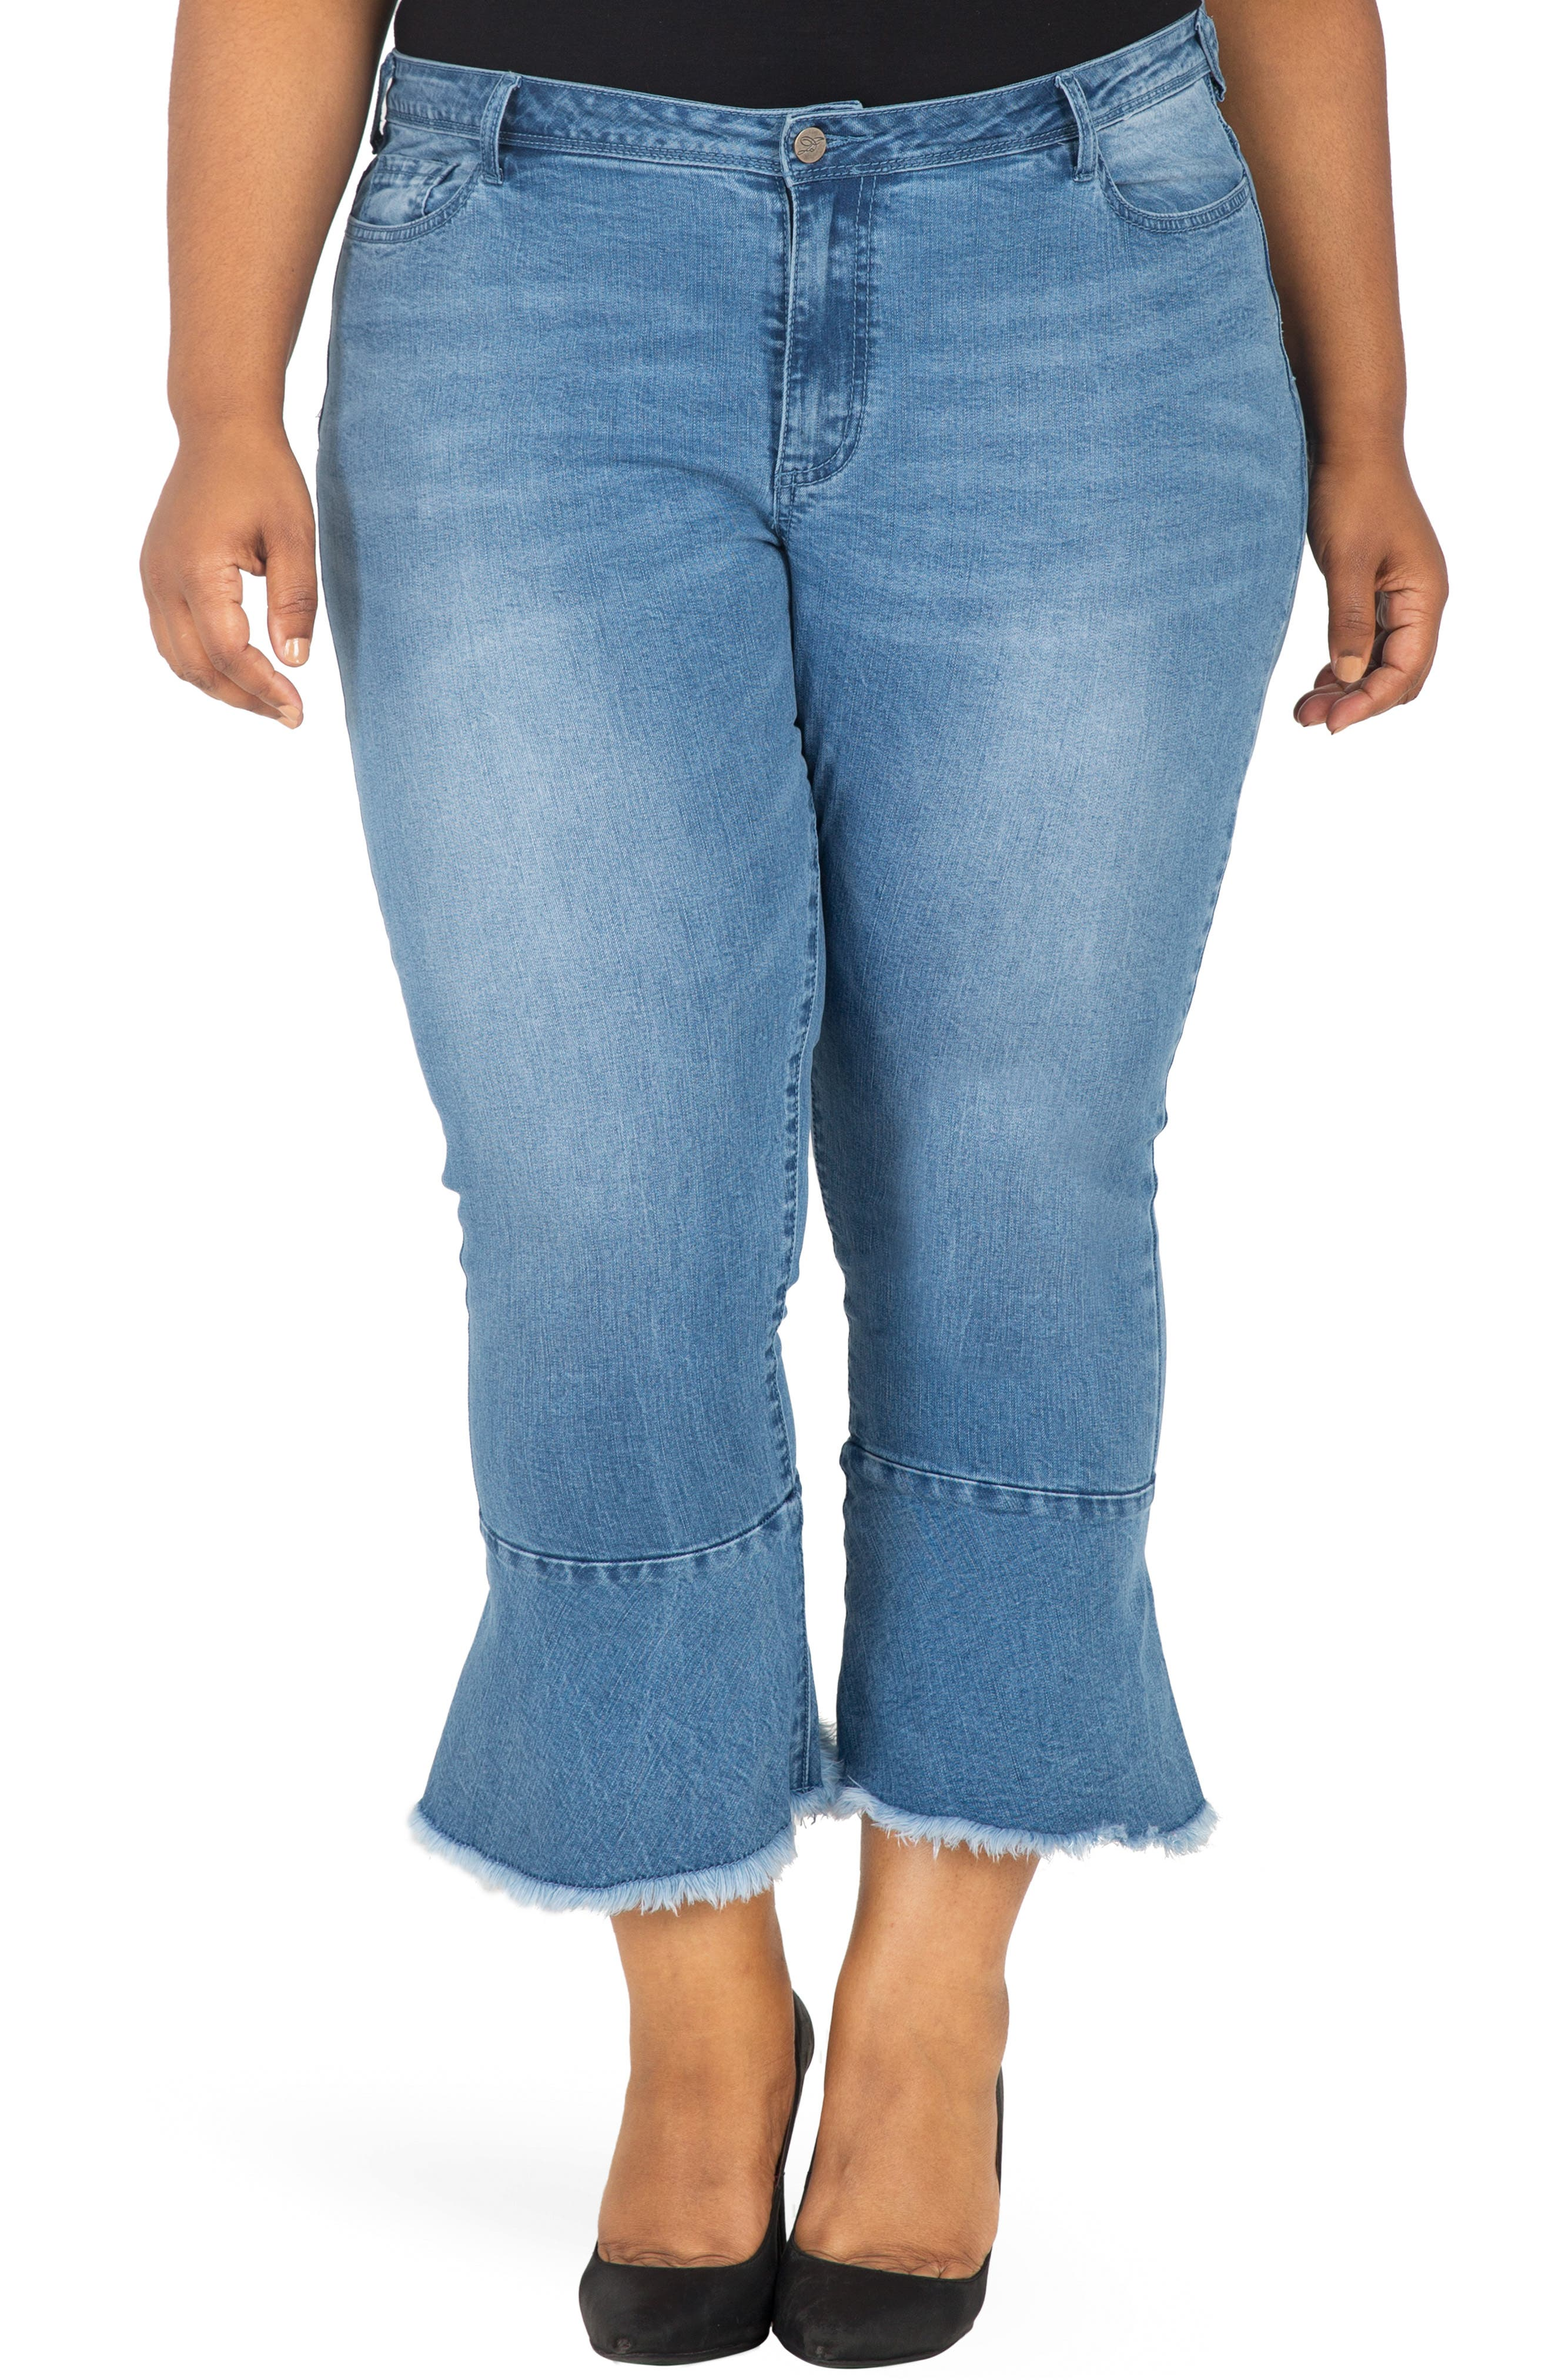 POETIC JUSTICE Kesha Ruffle Skinny Jeans, Main, color, BLUE